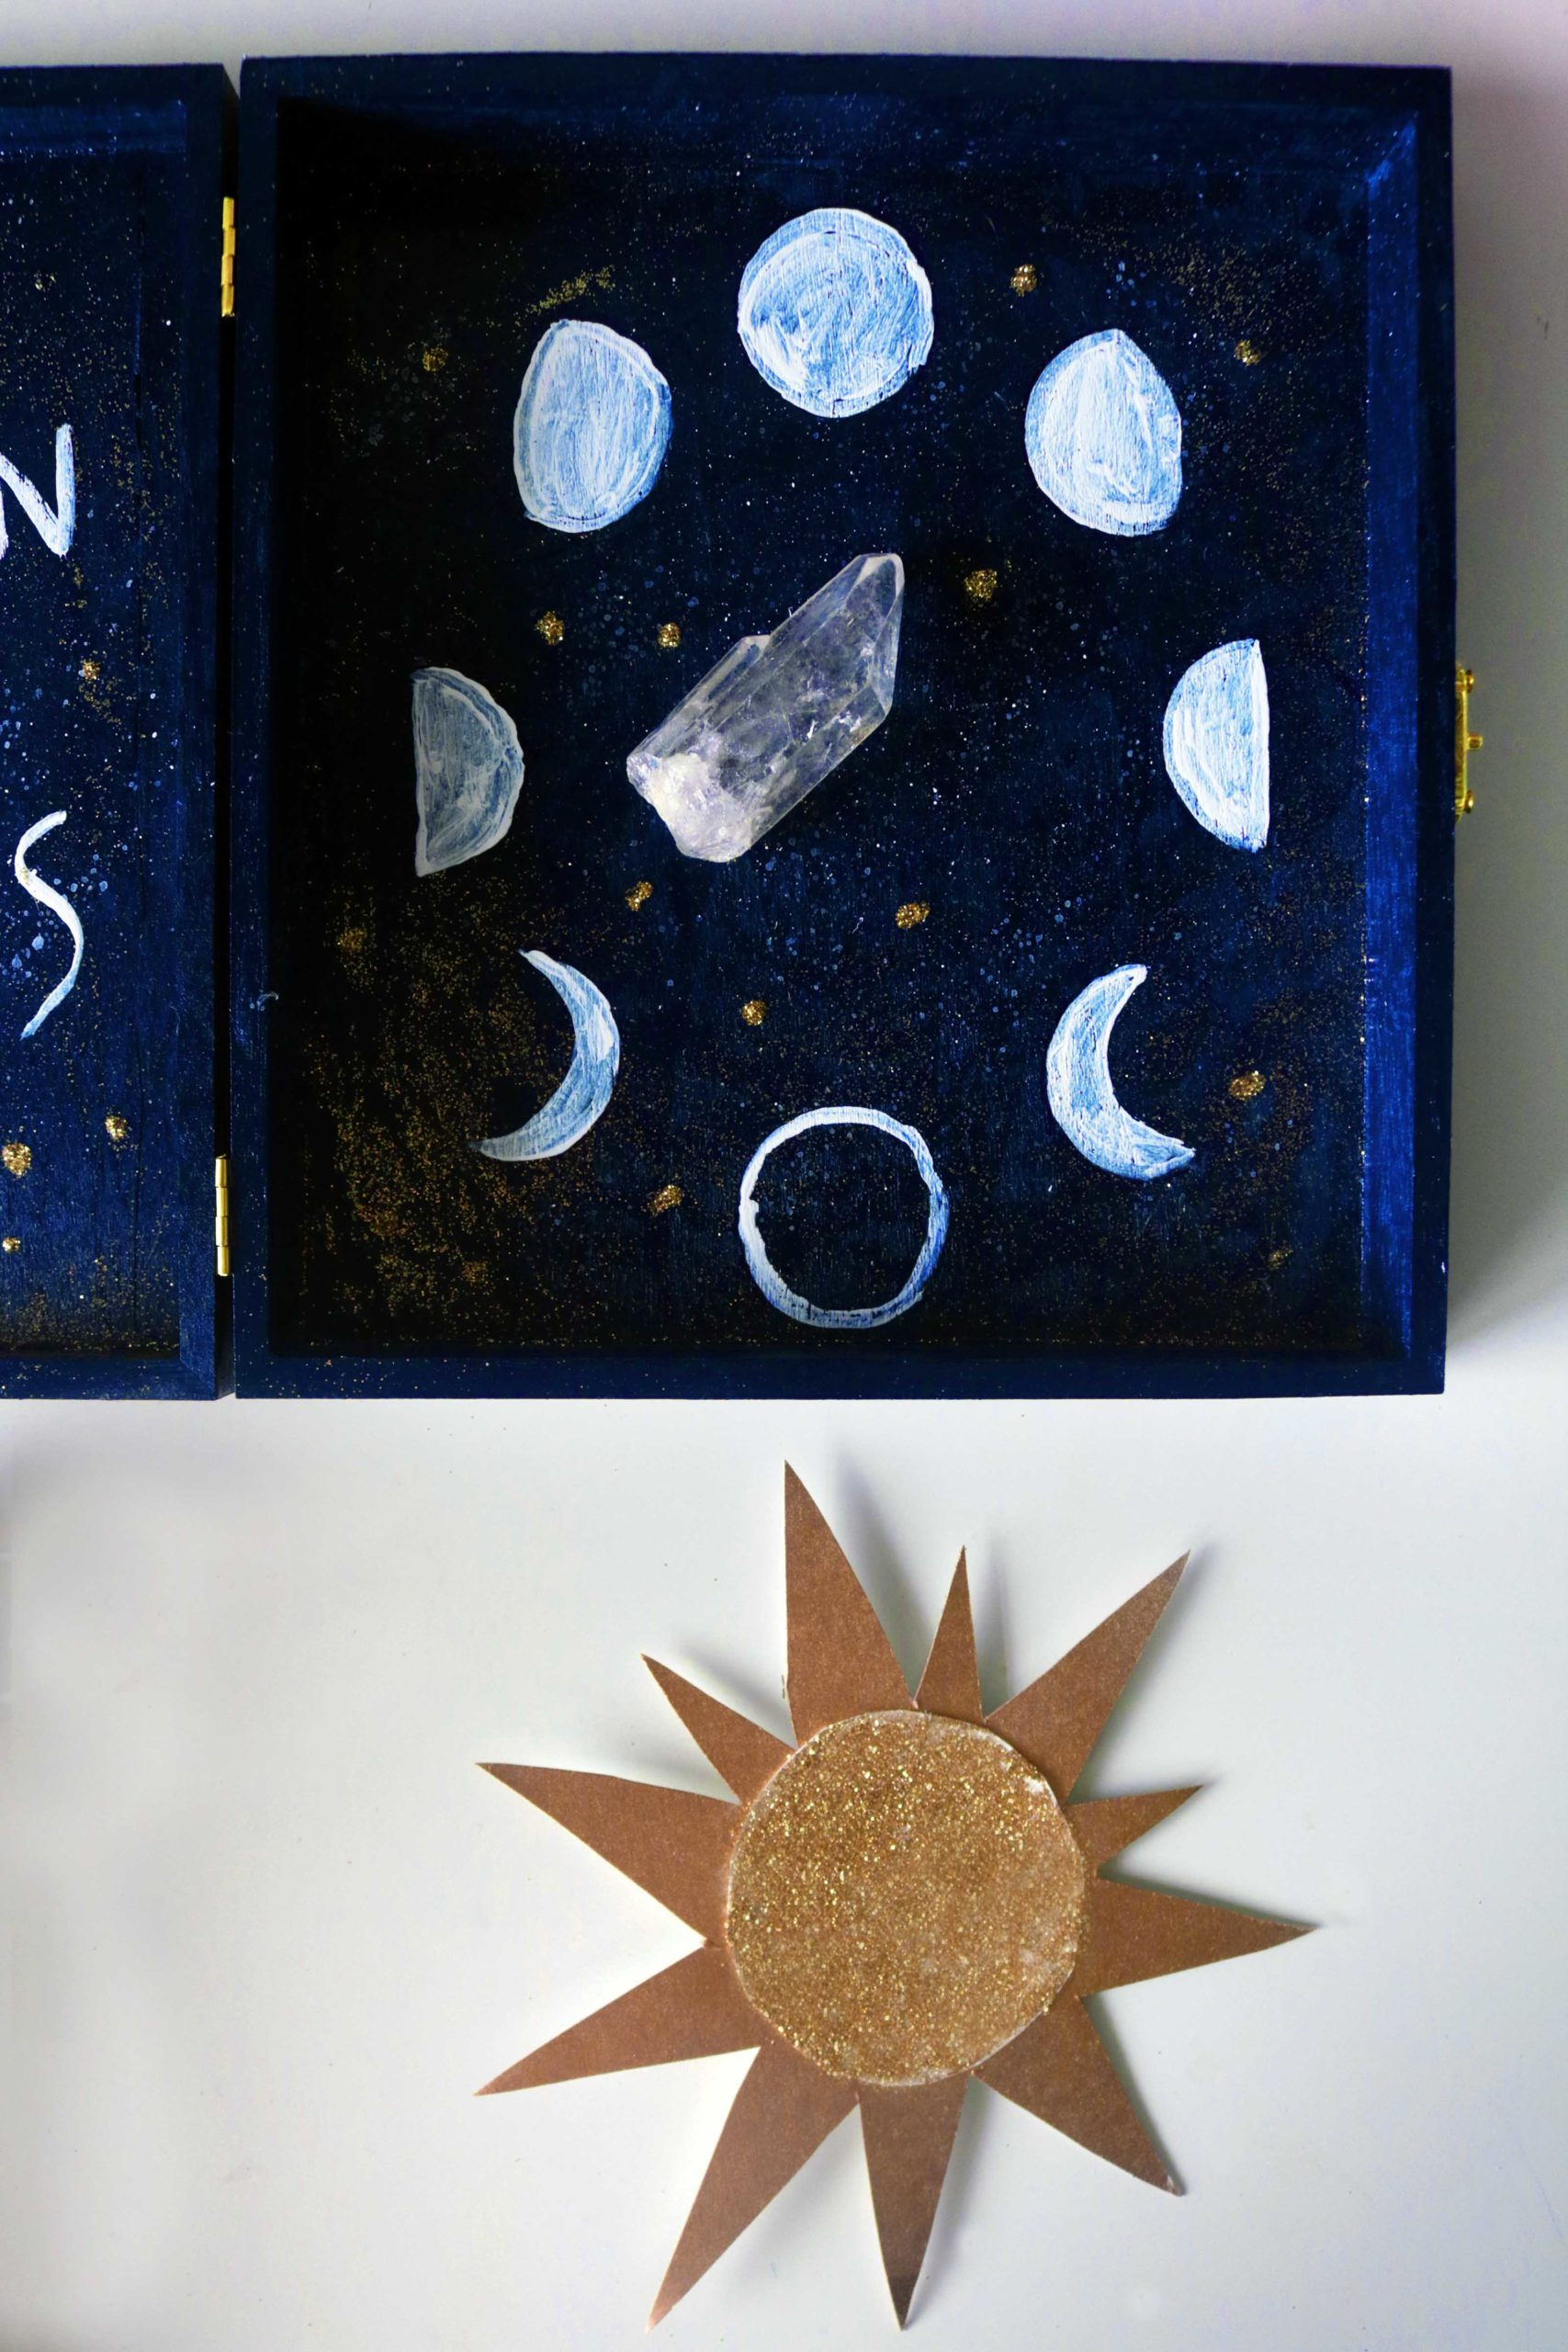 Moon phase tracker easy DIY craft.